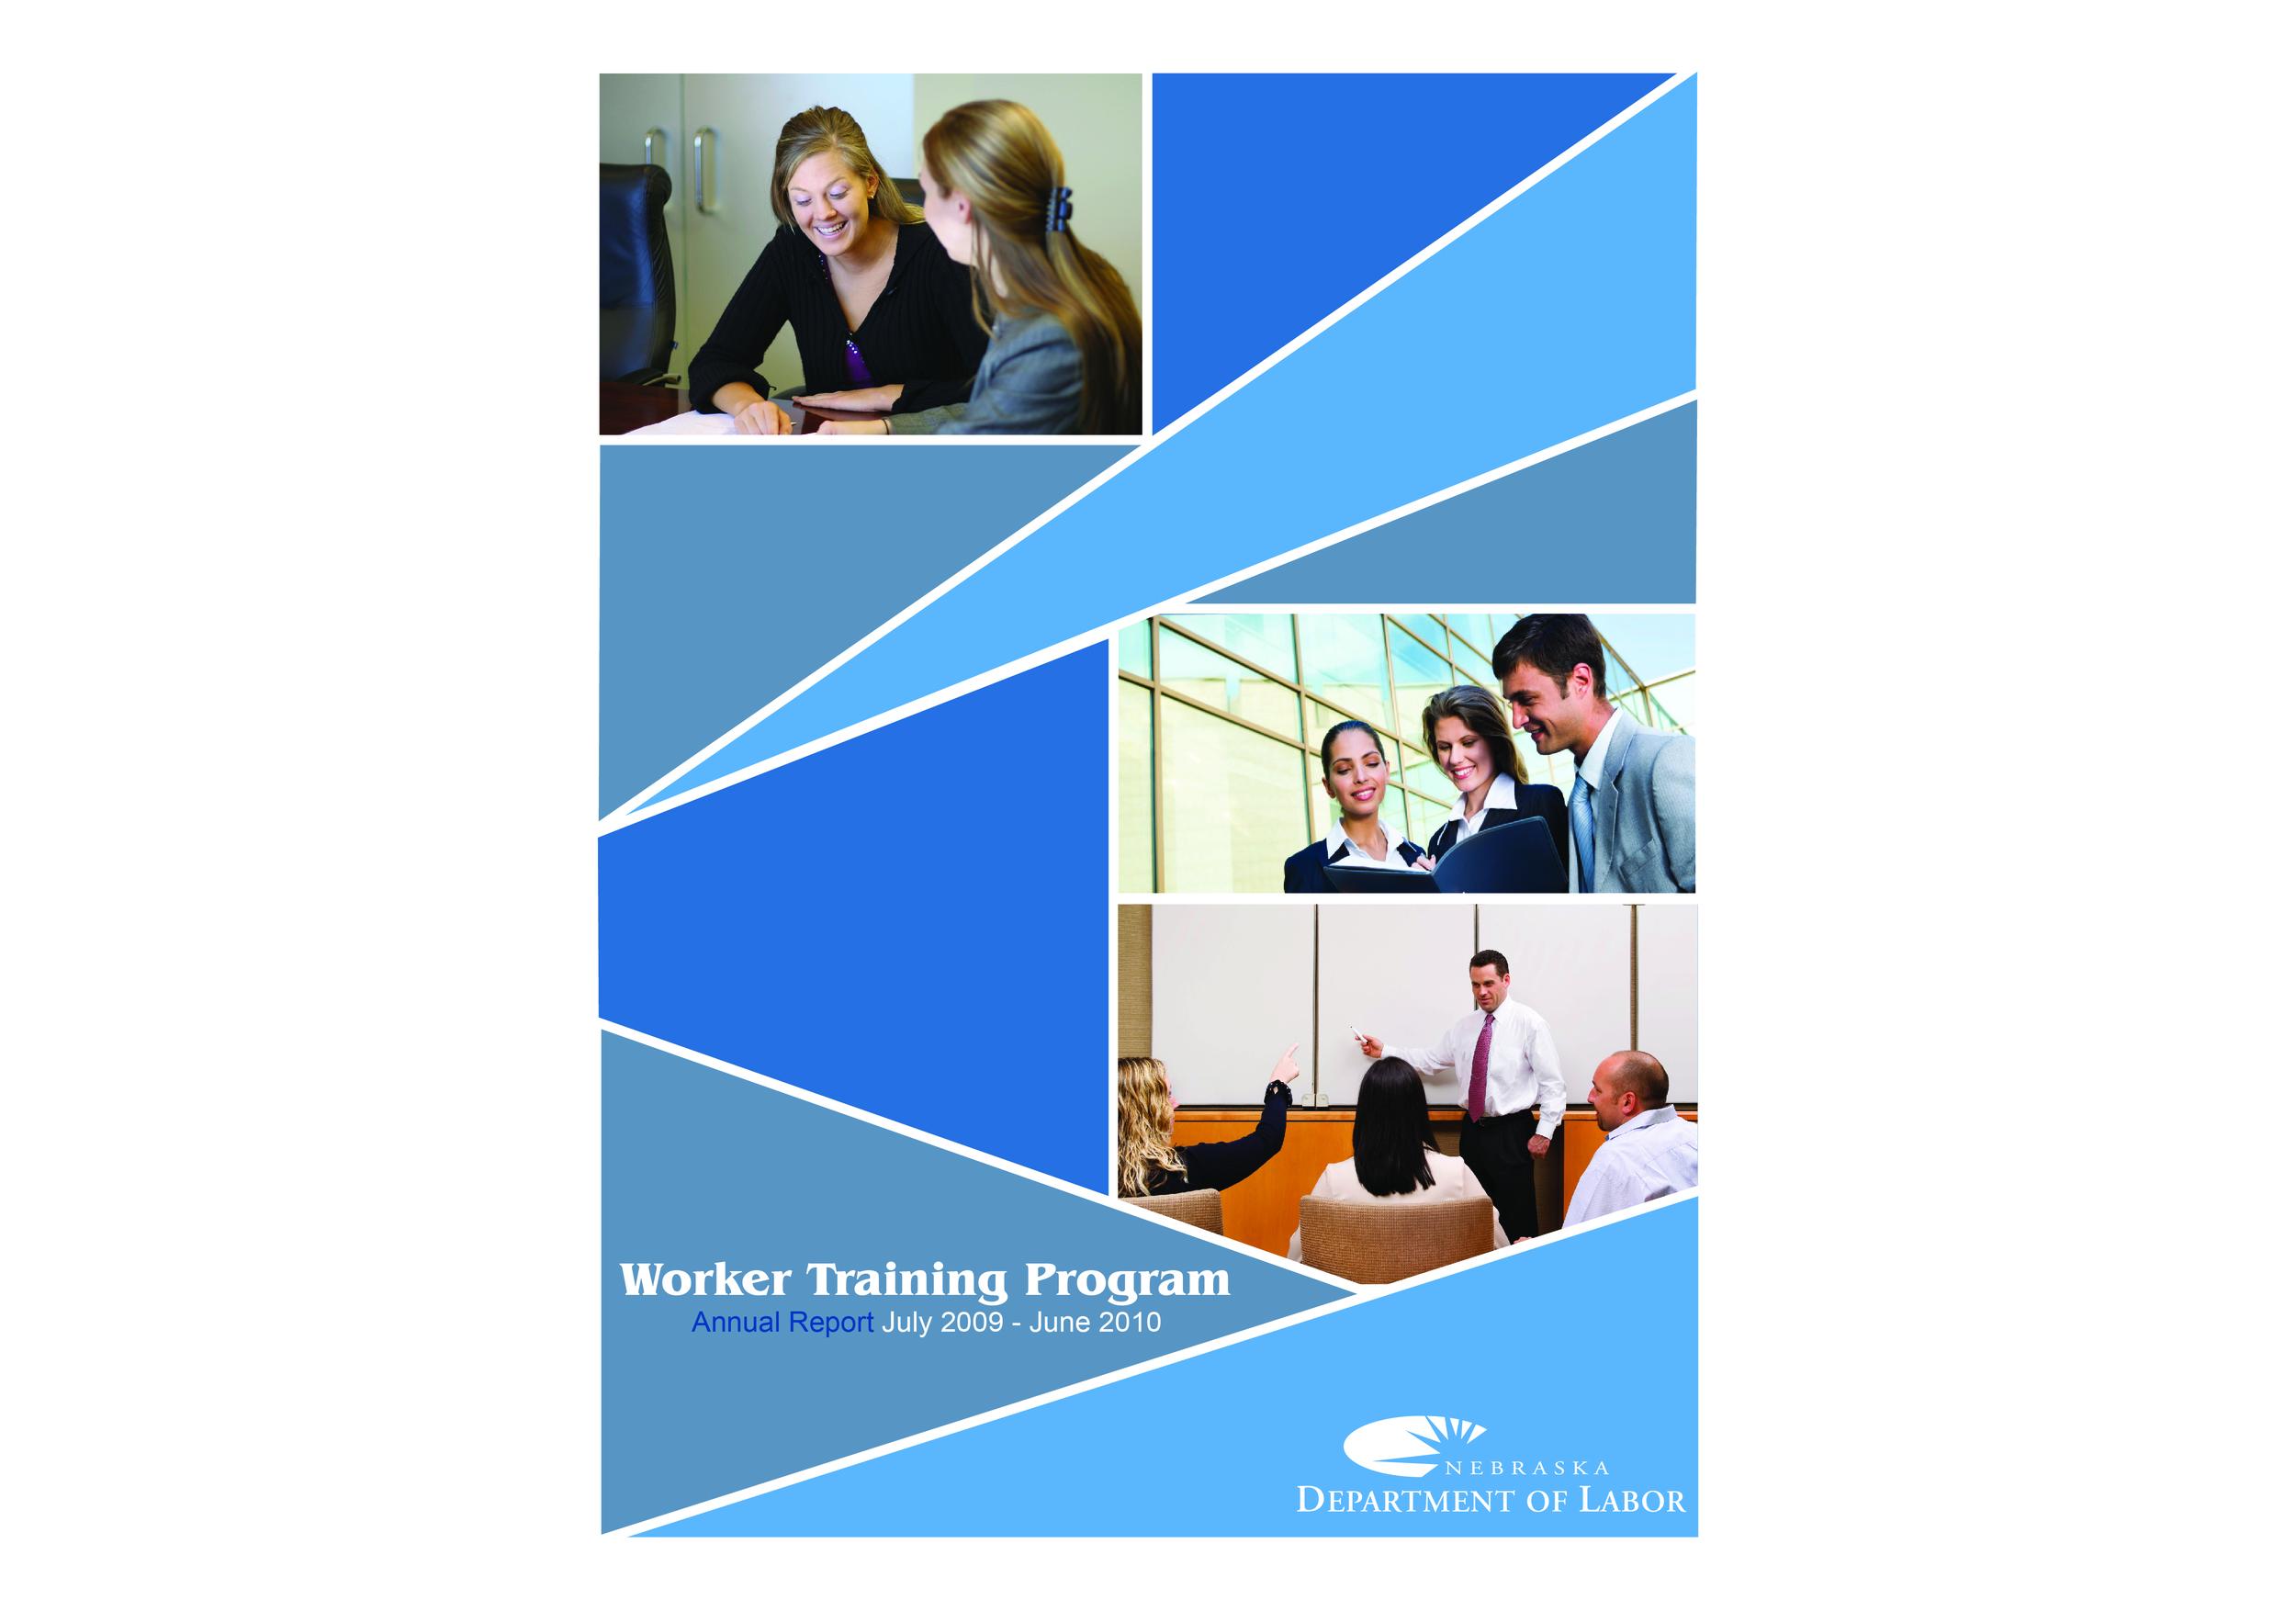 WorkerTrainingProgram09-01.jpg